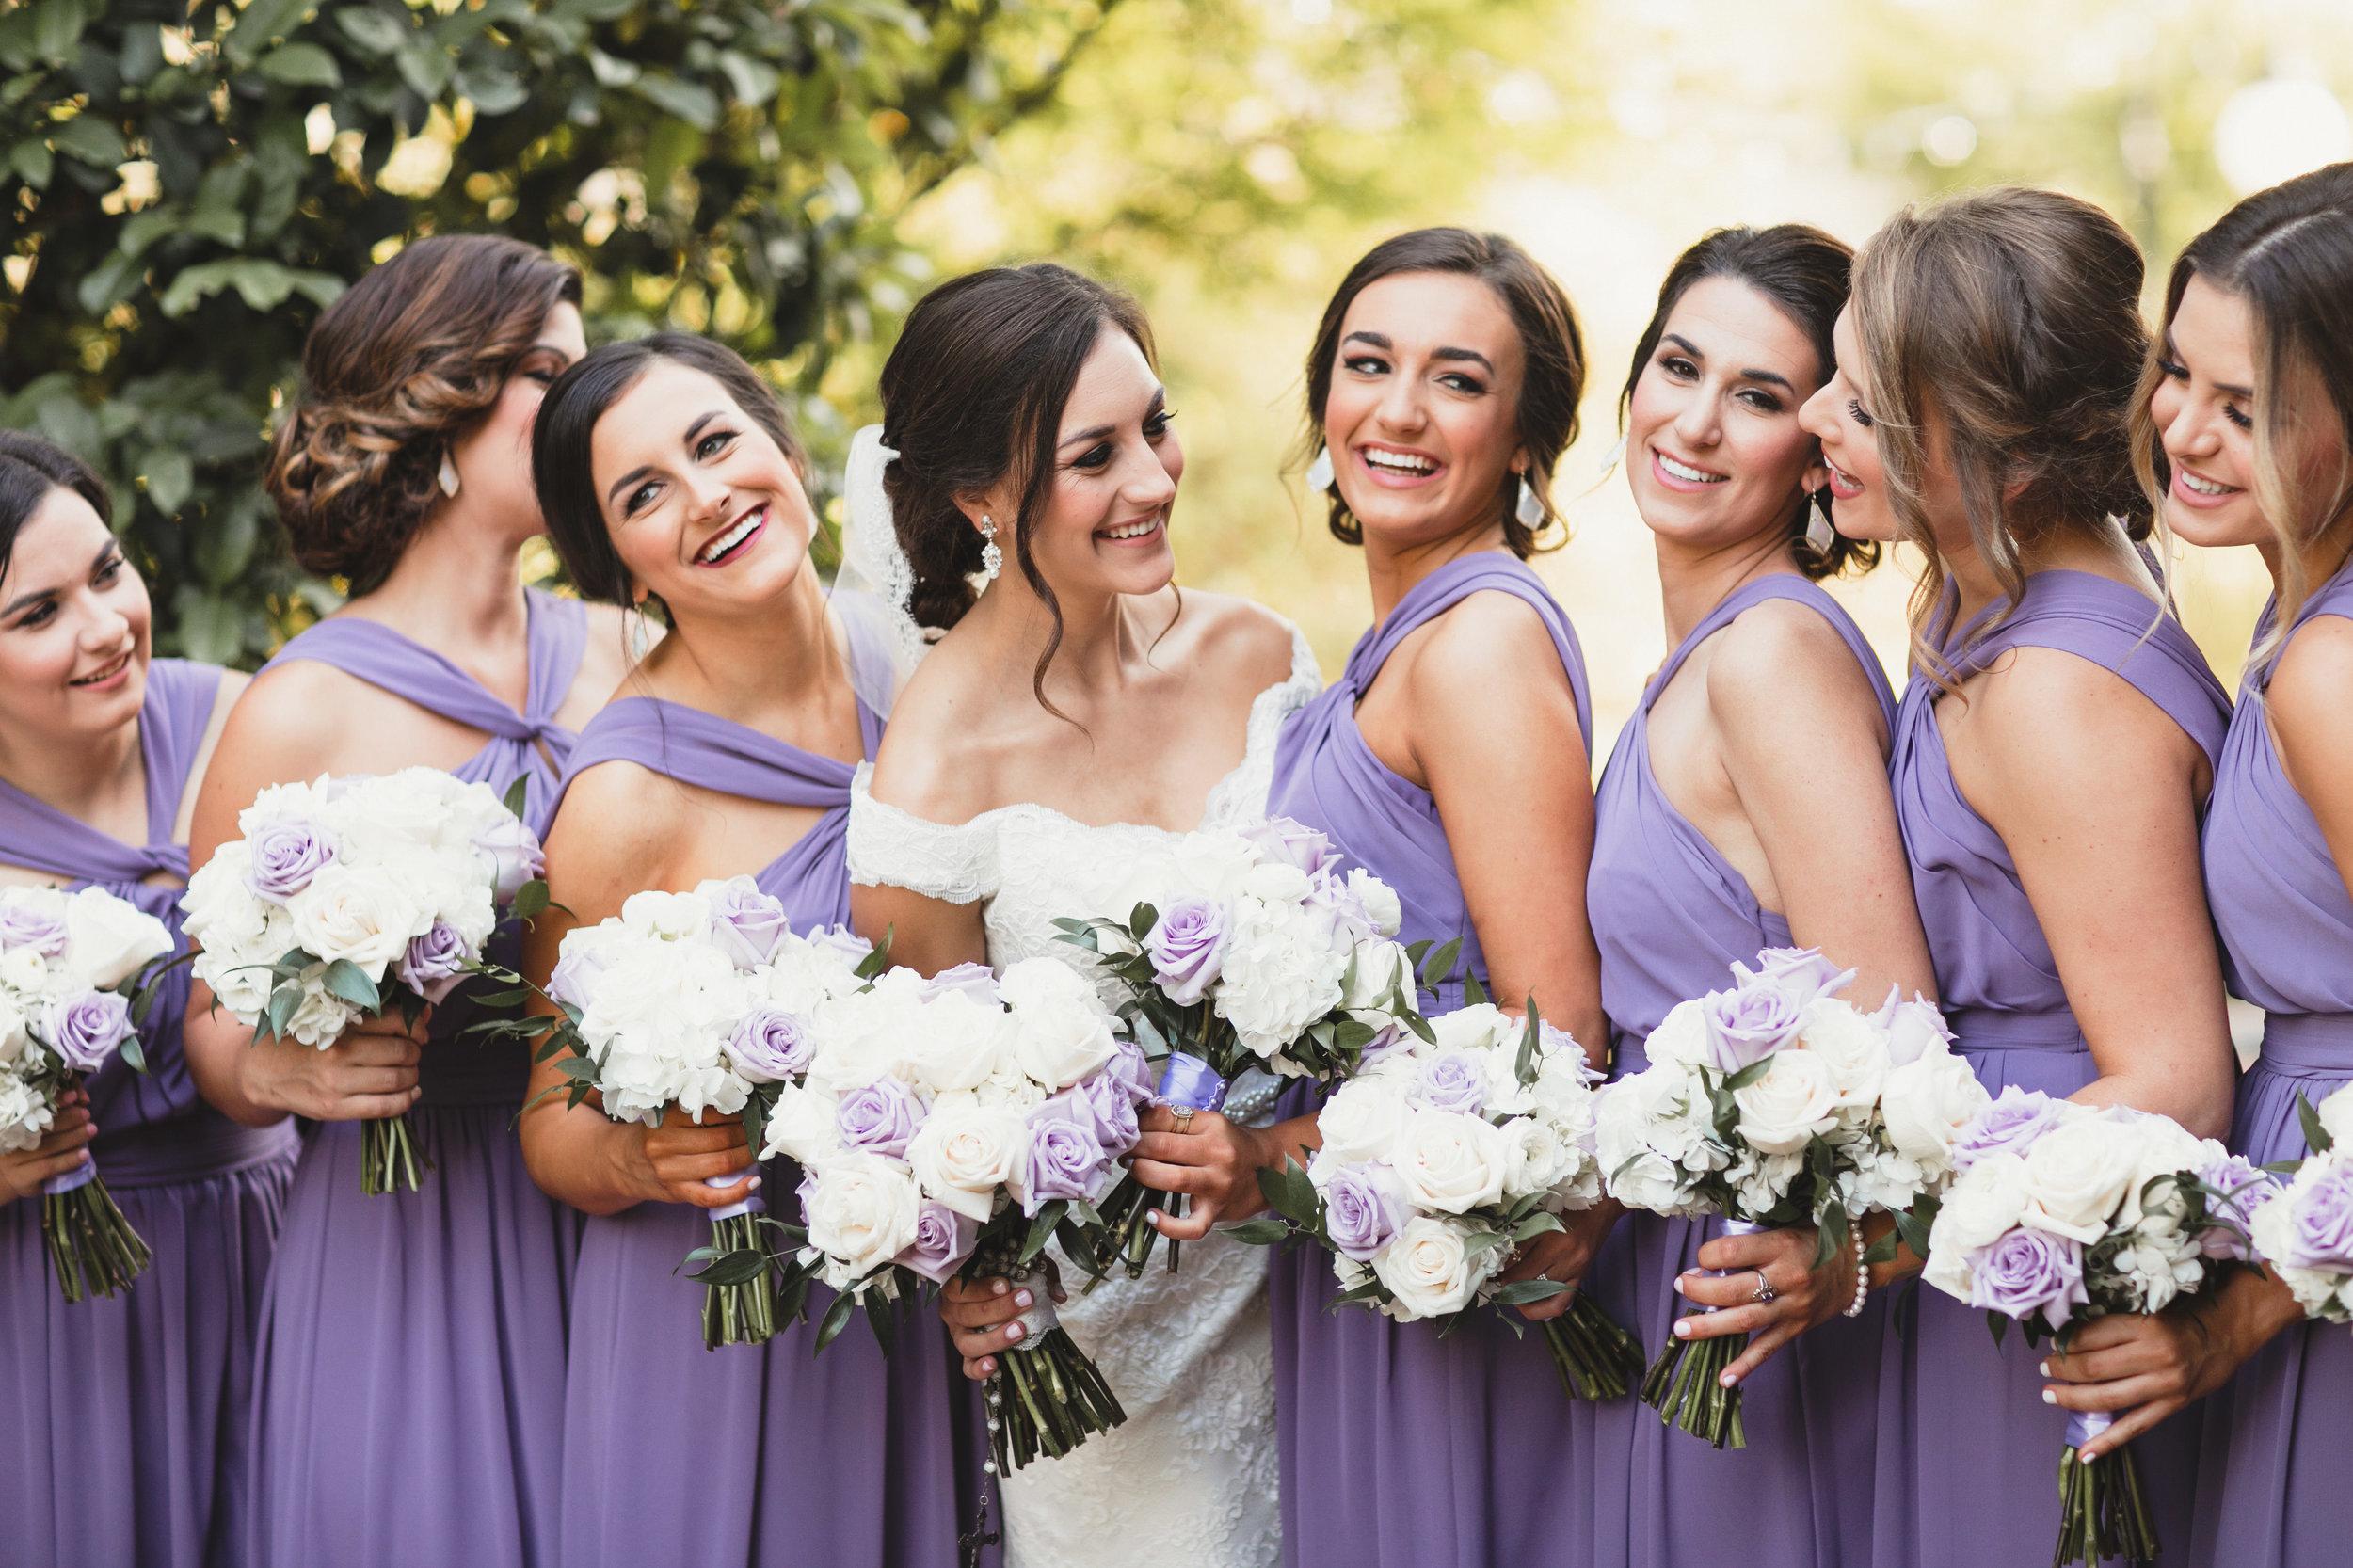 Citron_Bergeron_wedding-0169.jpg